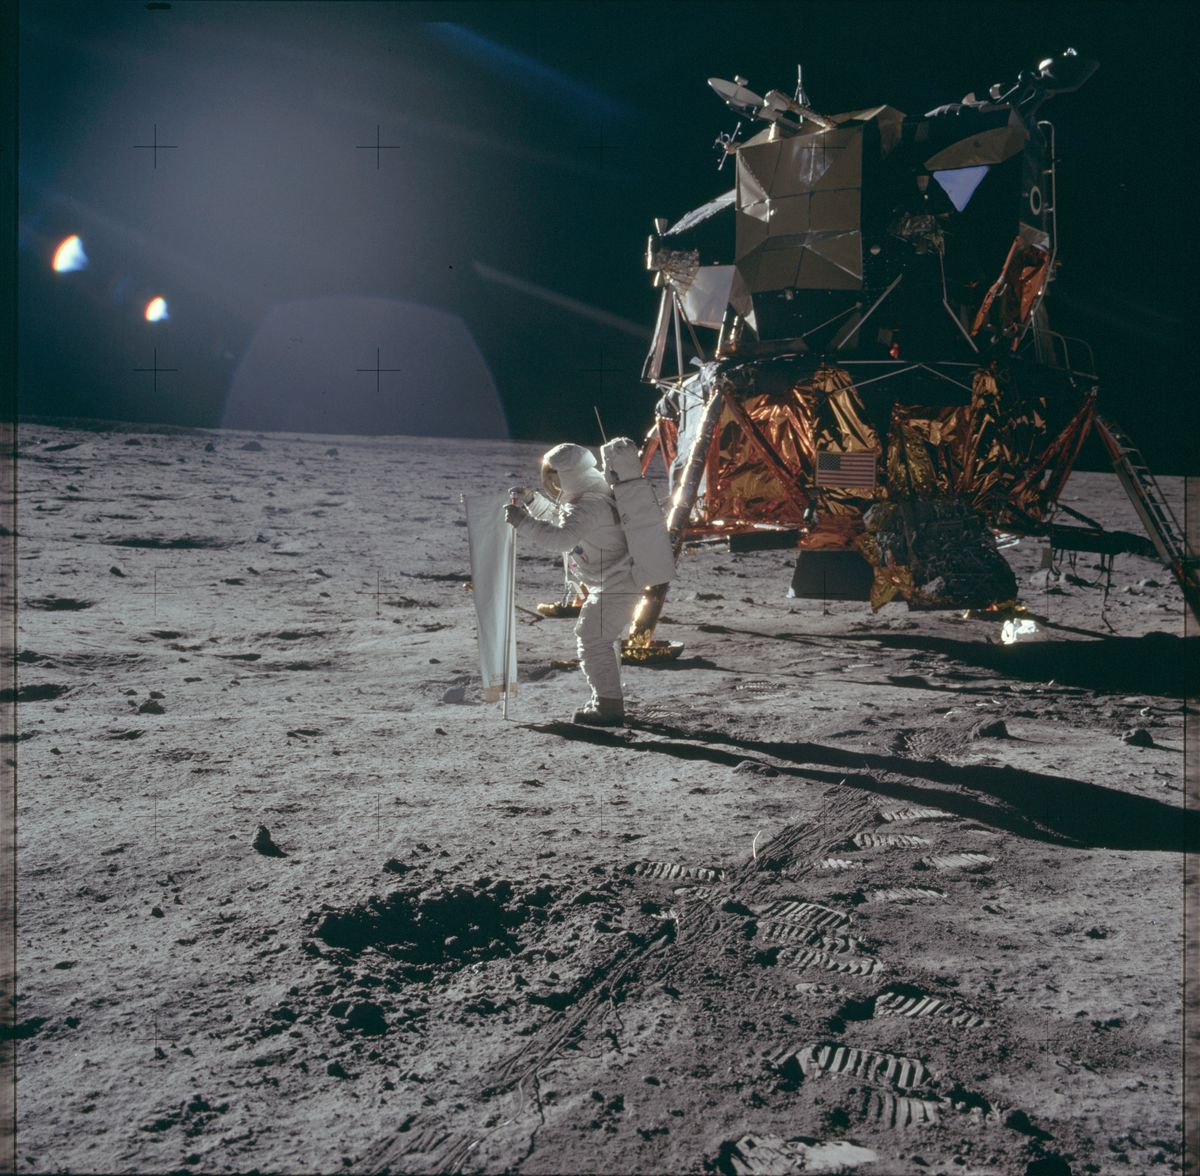 Apollo 11 anniversary: Astronauts left their poop on the moon  NASA